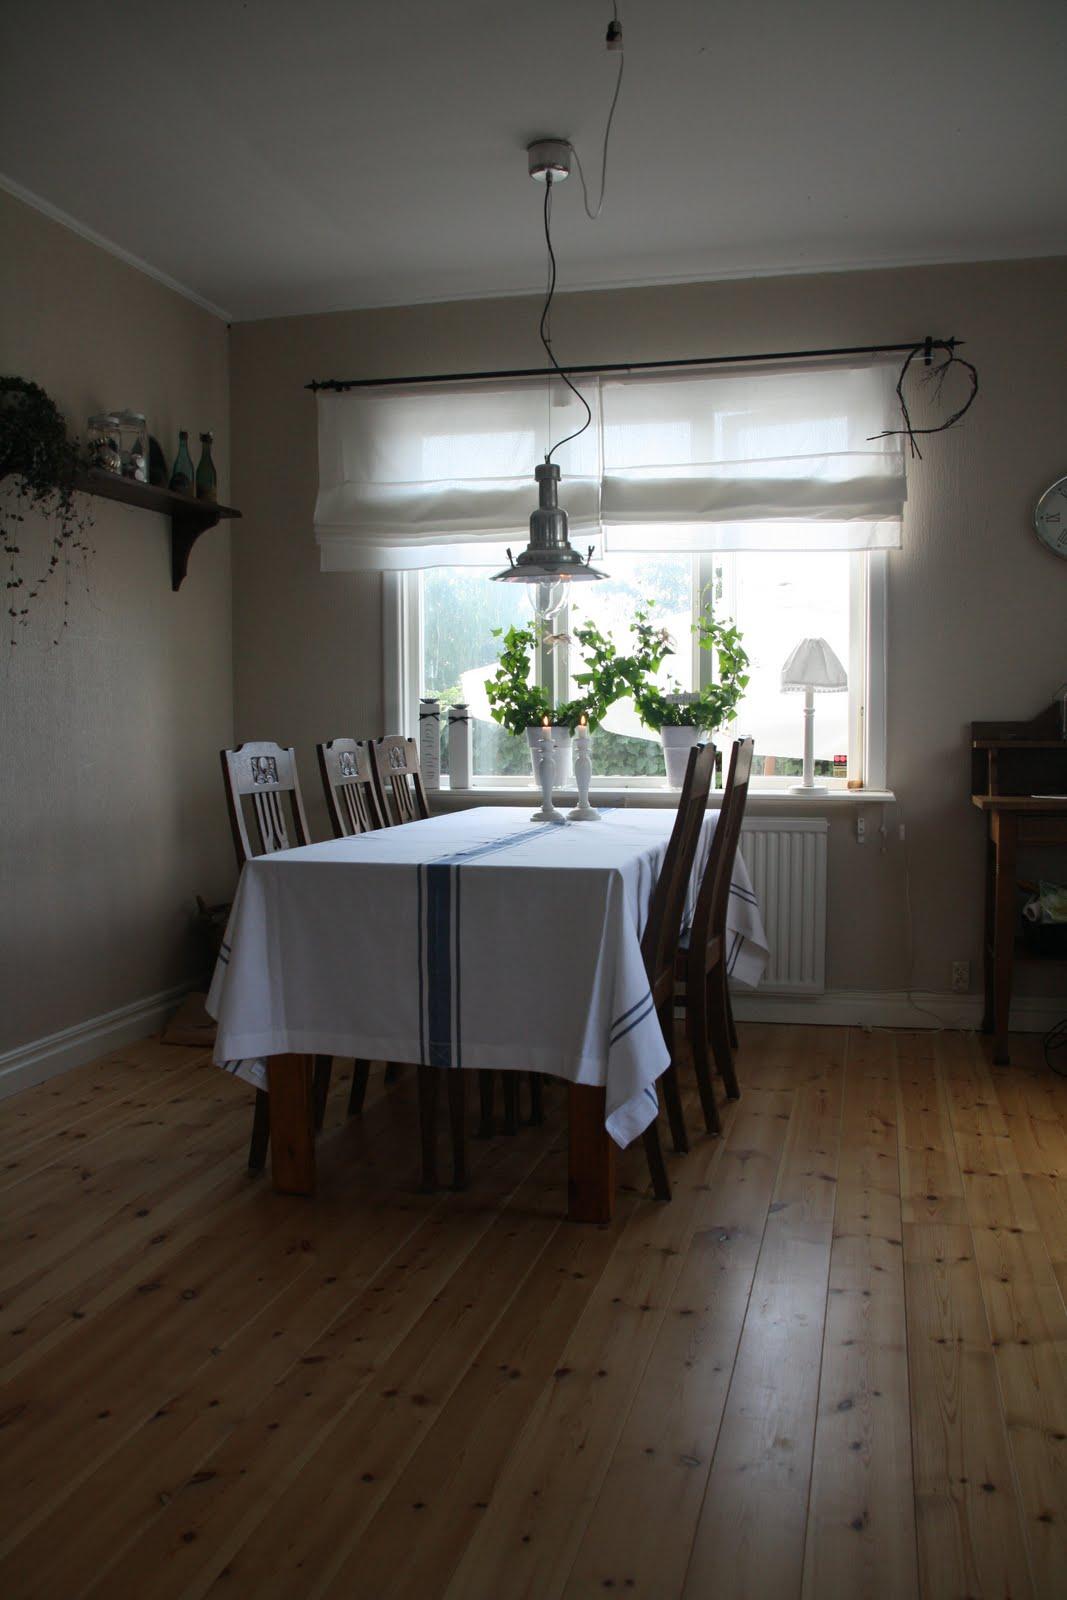 Gula Koket : Nea i det gula huset Lite nygammalt till koket!